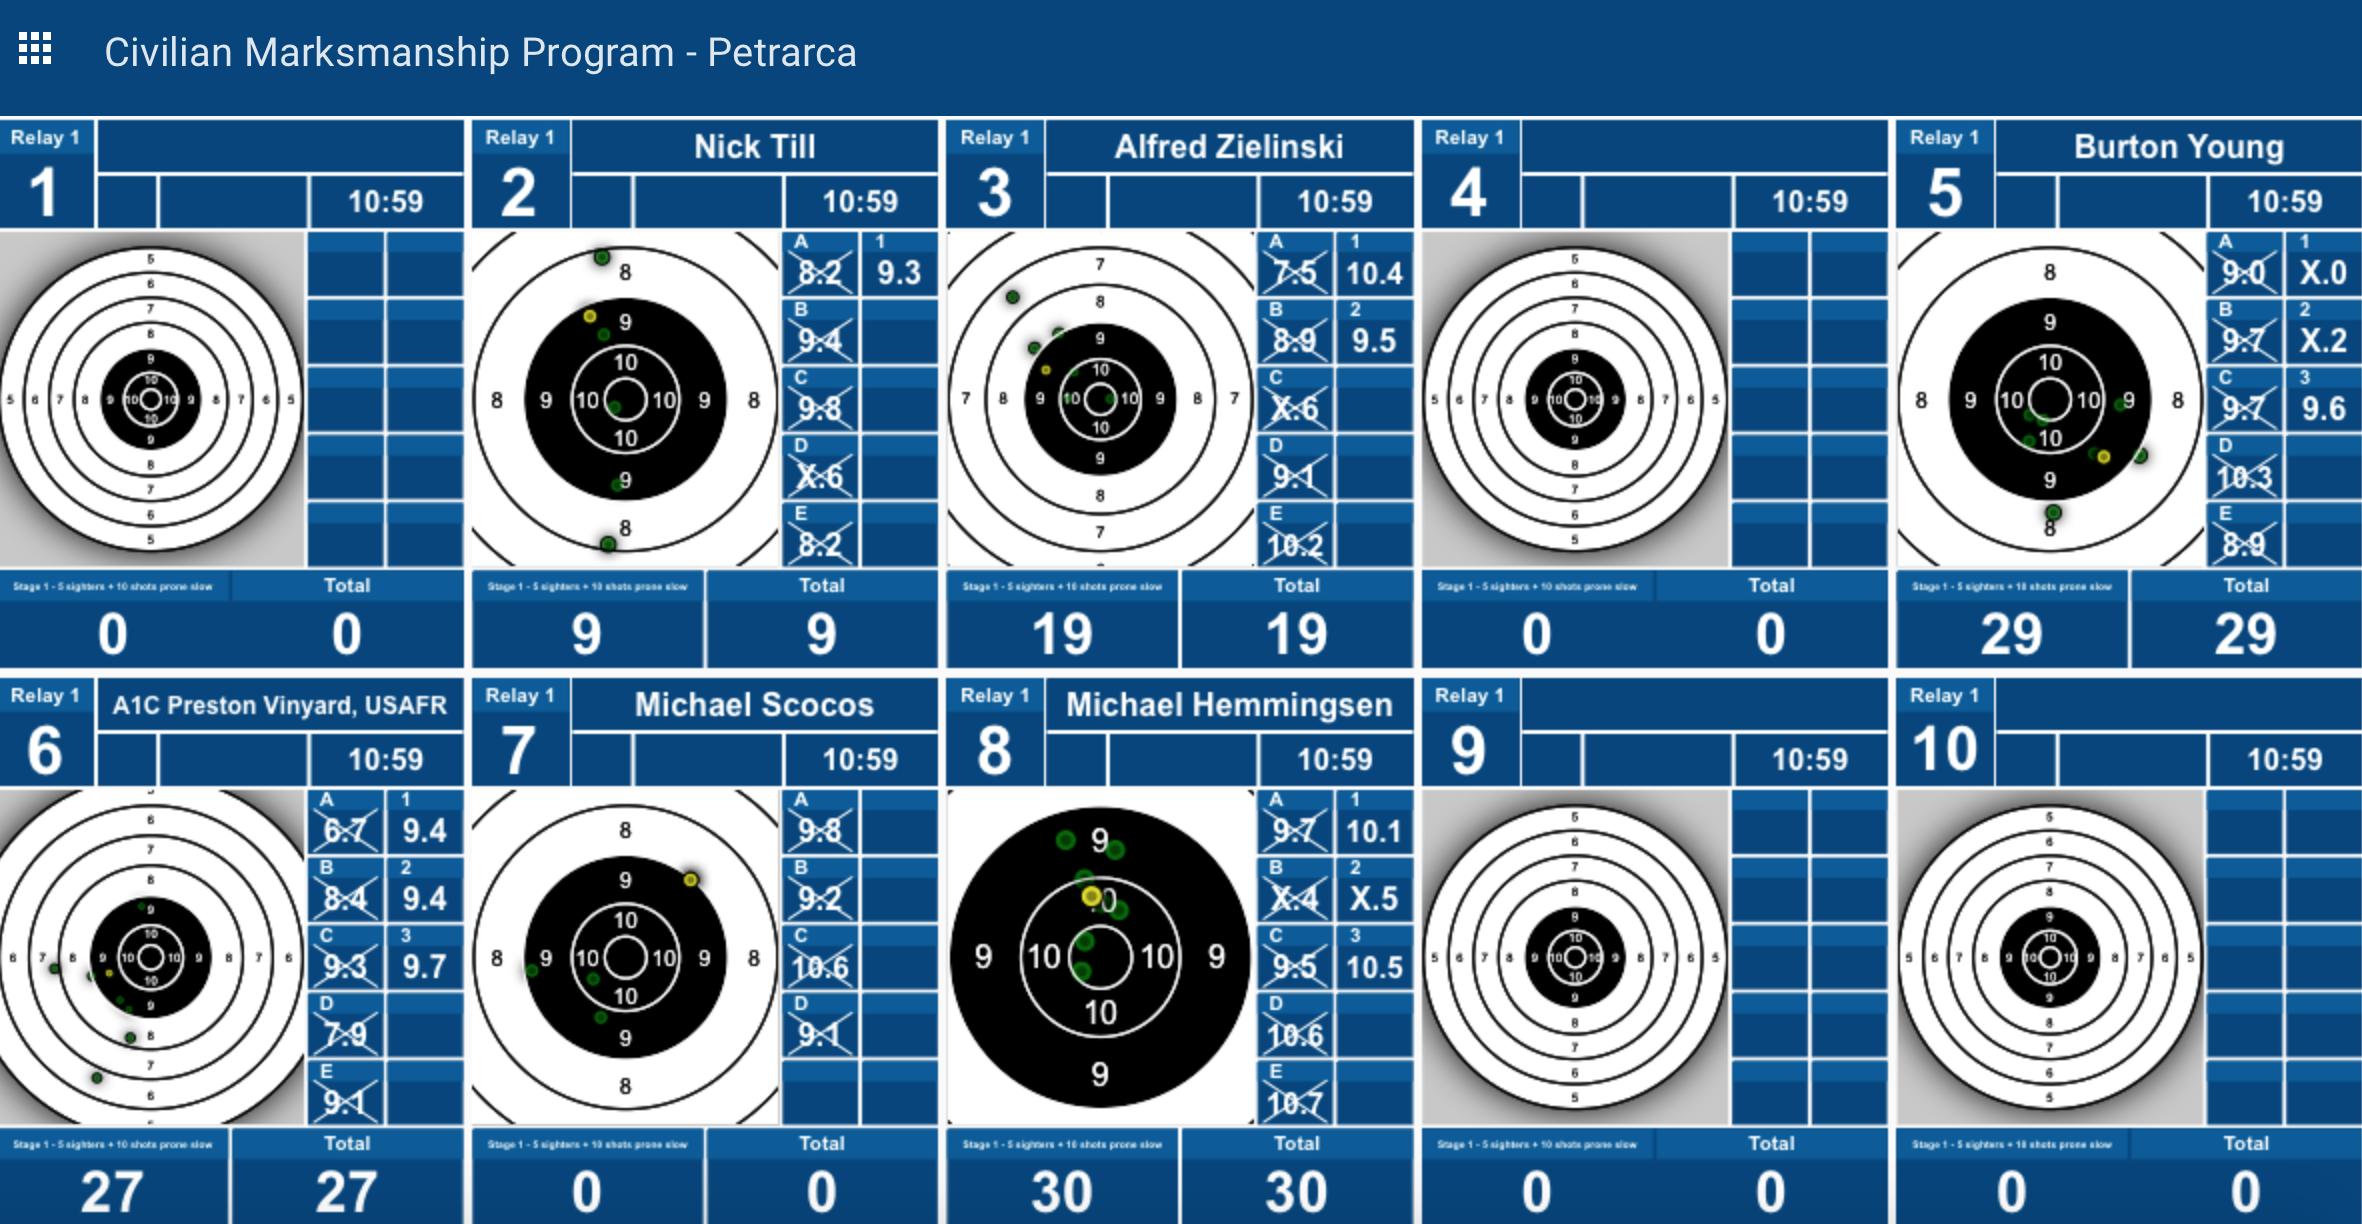 CMP Pistol Program - Civilian Marksmanship Program